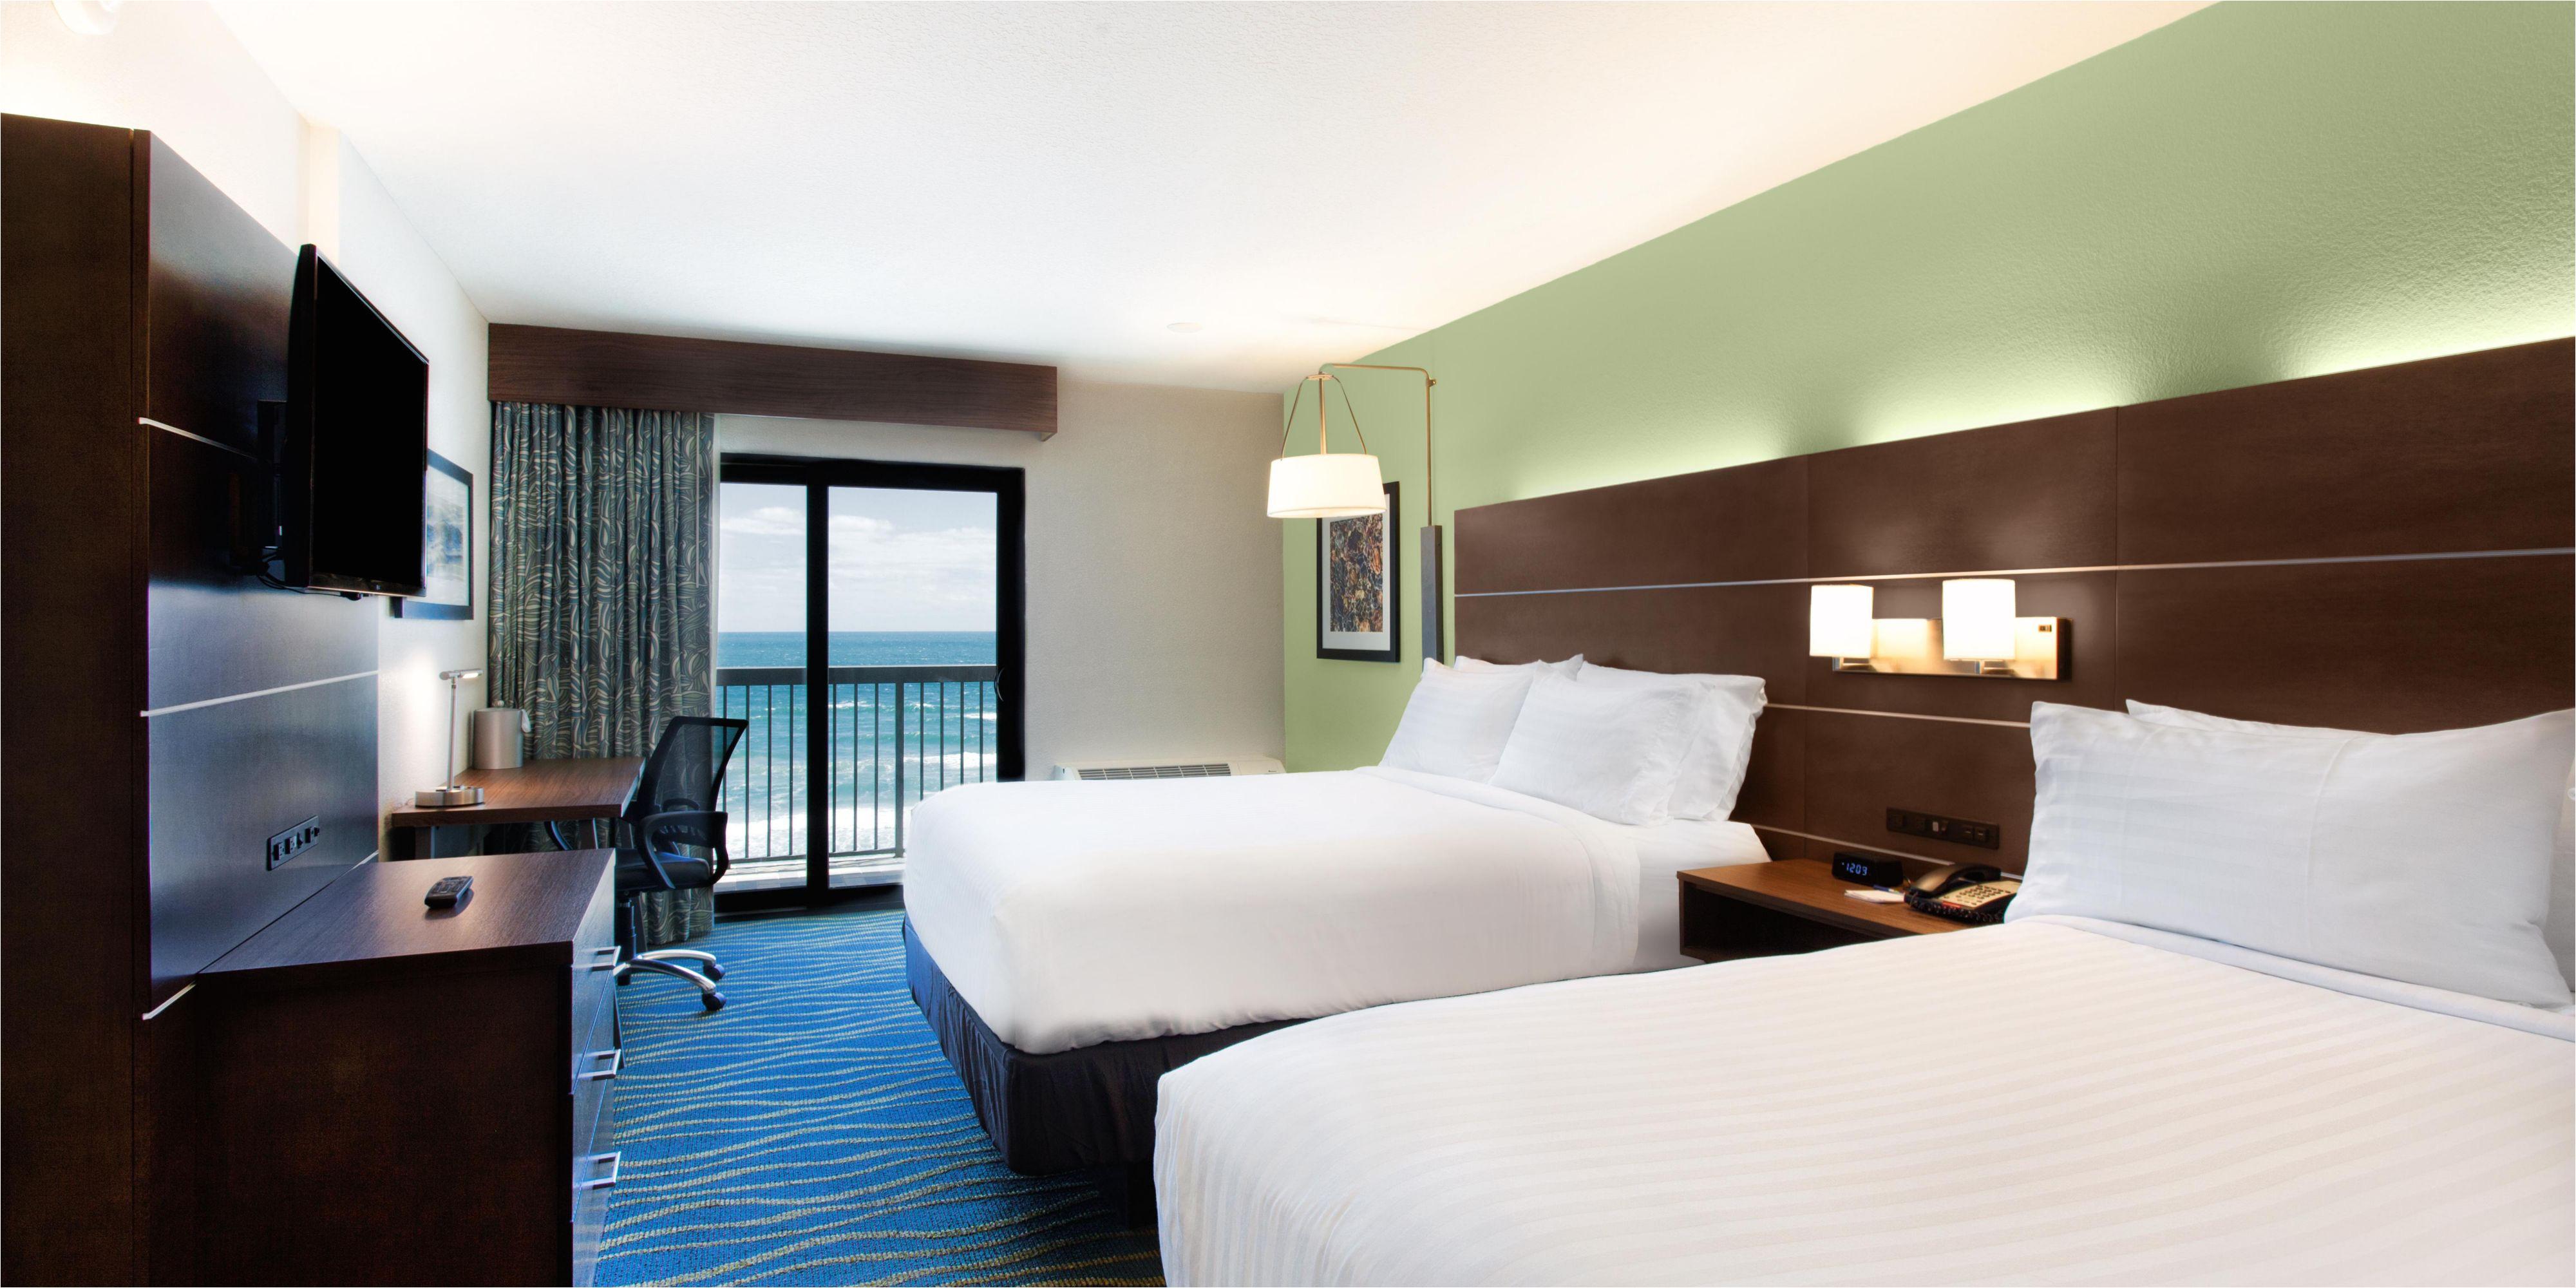 holiday inn express and suites daytona beach shores